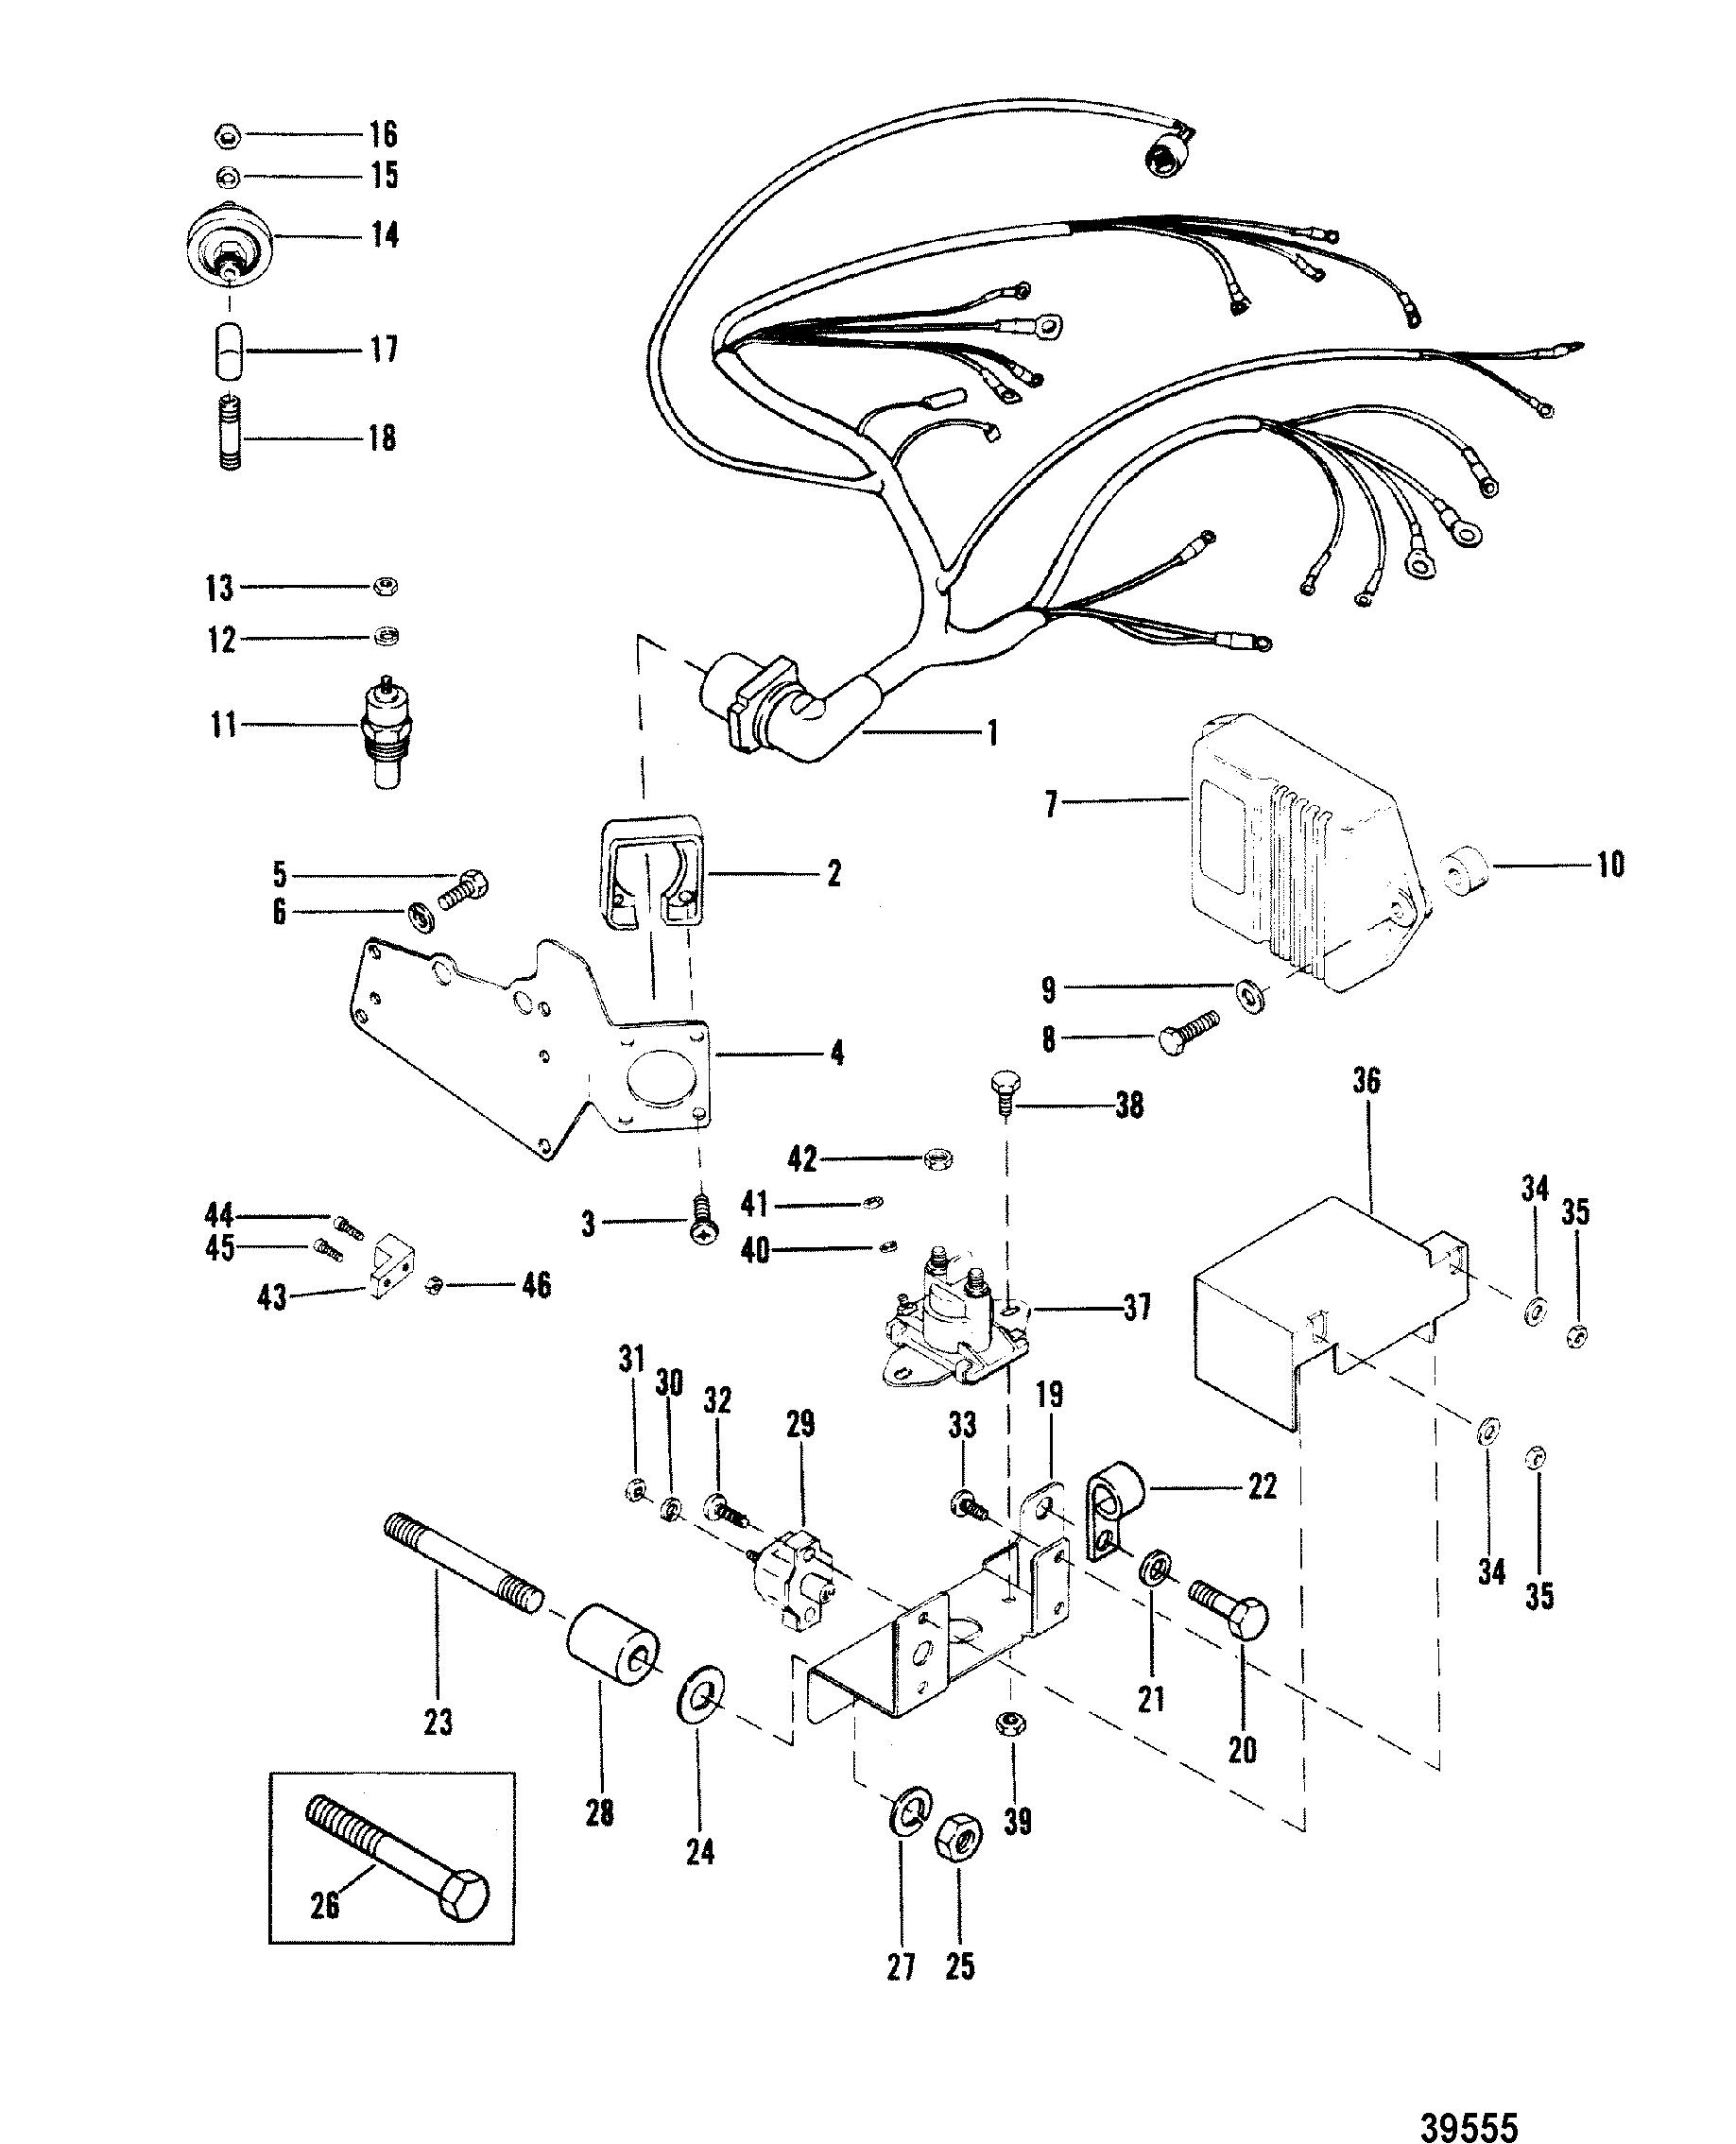 1985 Bayliner Wiring Diagram Manual Of Capri Harness Engine